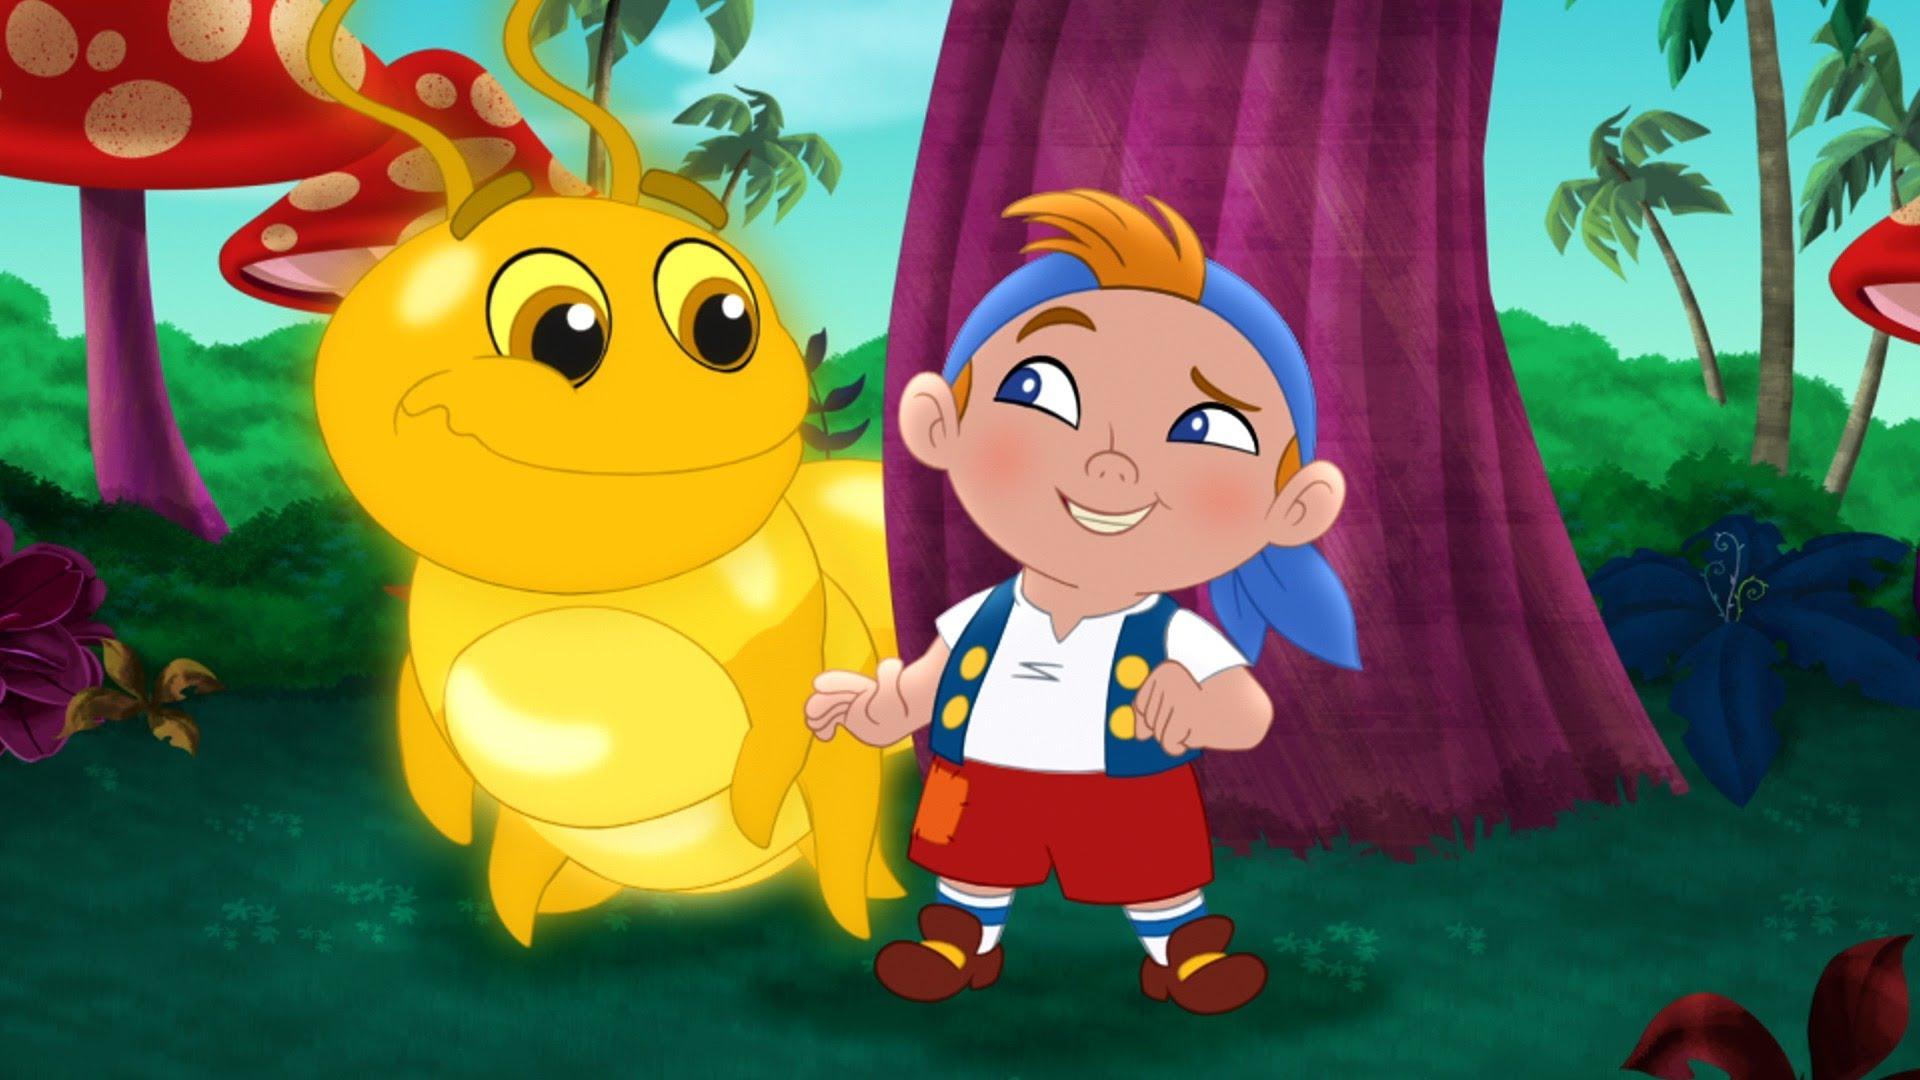 Golden Caterpillar | Jake and the Never Land Pirates Wiki | FANDOM ...